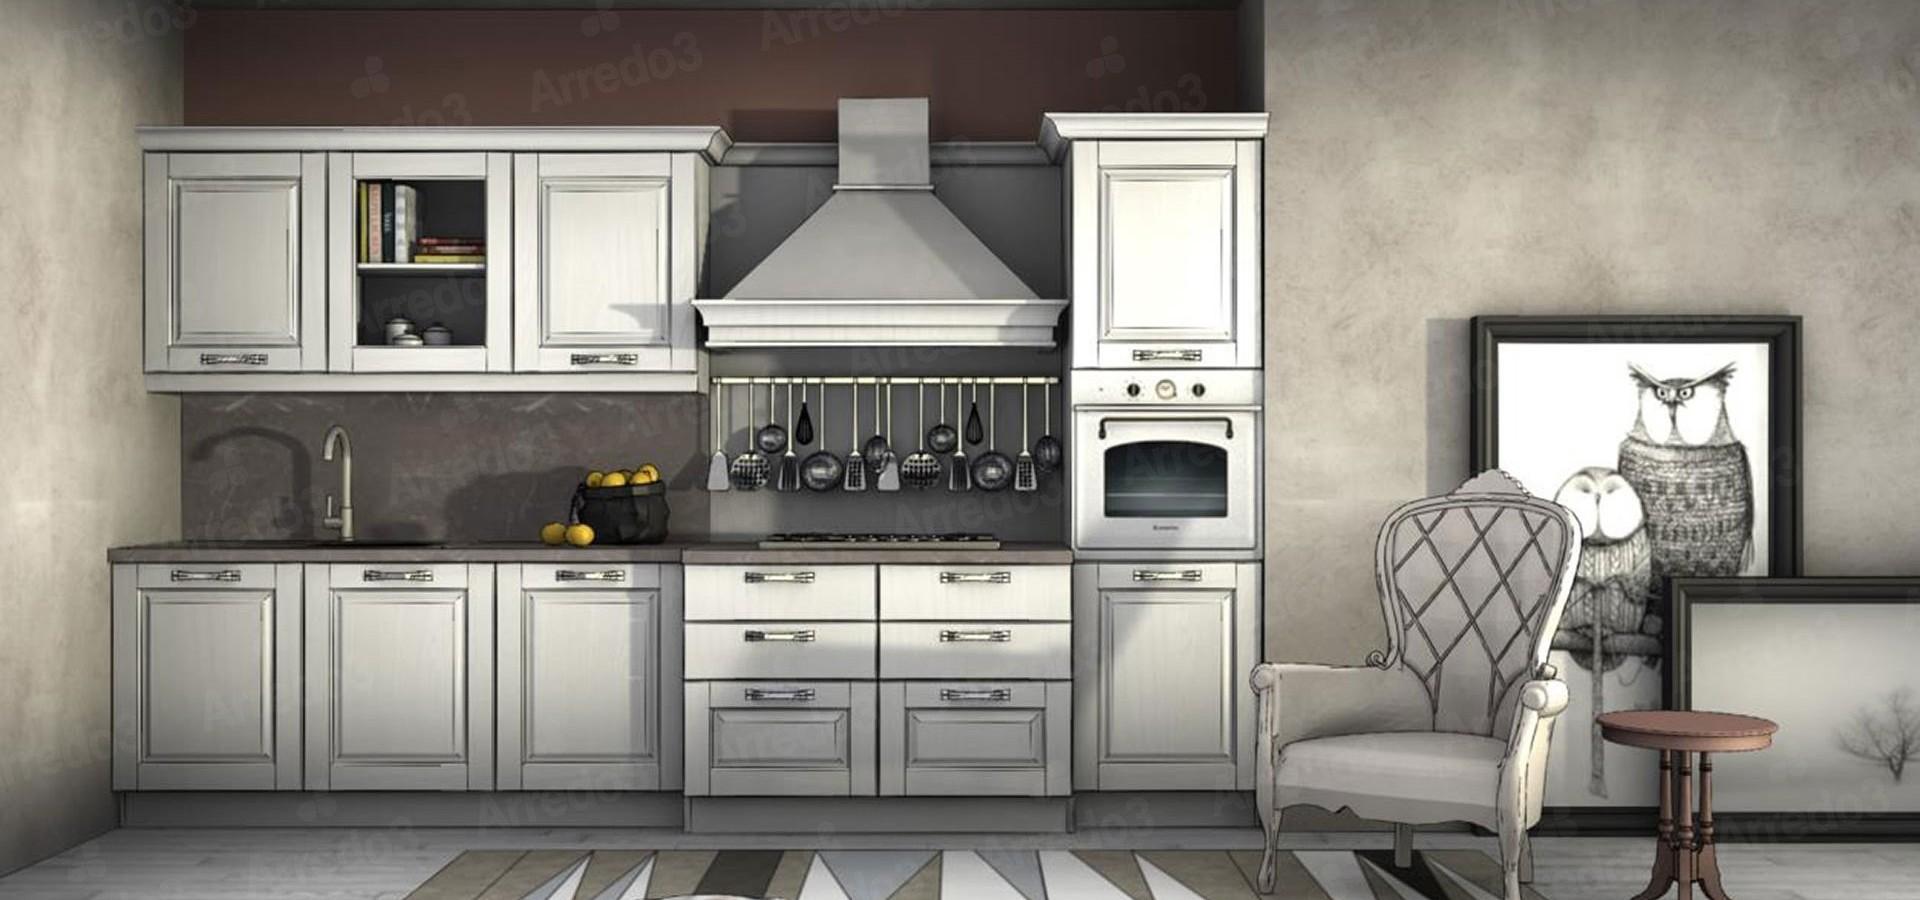 Итальянская Кухня ASOLO LC08 | Цена на Кухня ASOLO LC08 ARREDO3